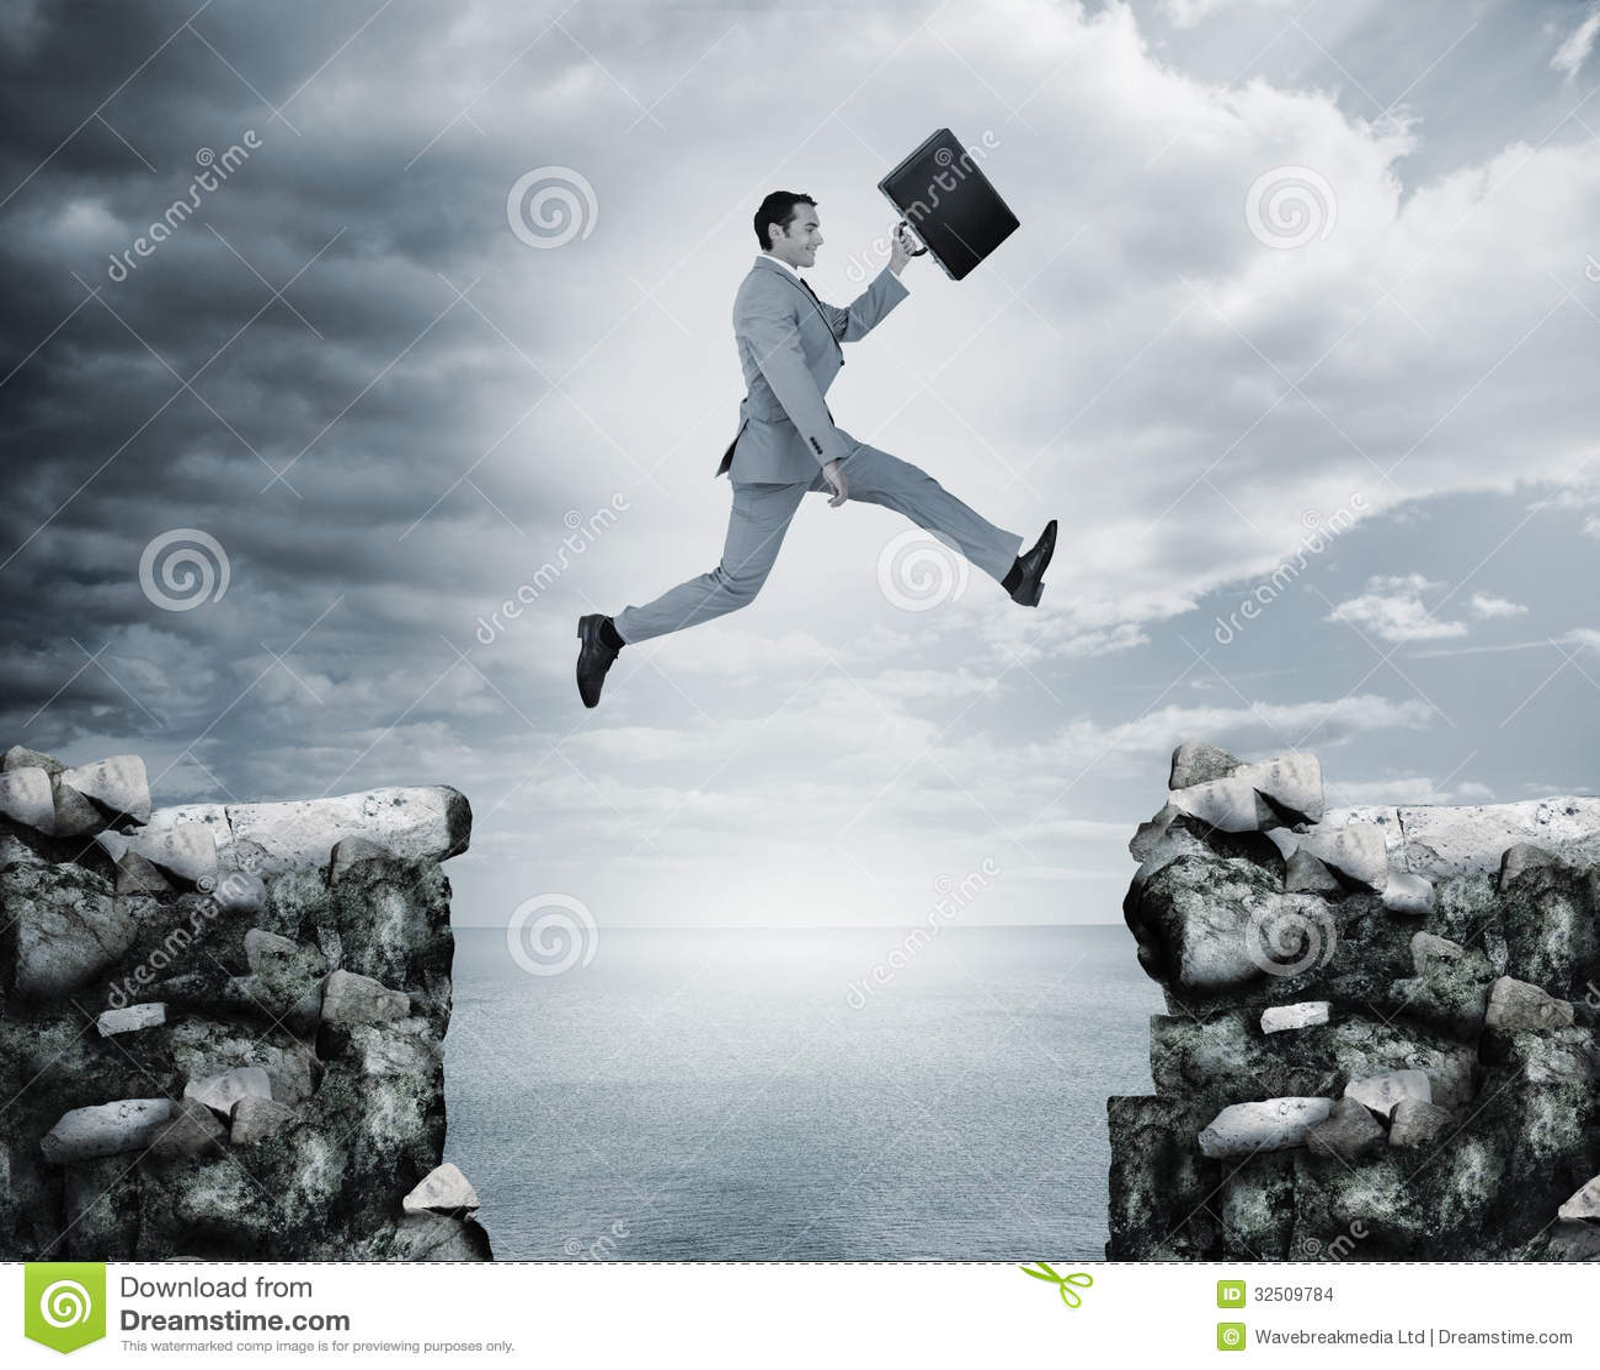 Businessman Quotes Wallpaper Businessman Jumping A Gap Between Cliffs Stock Images